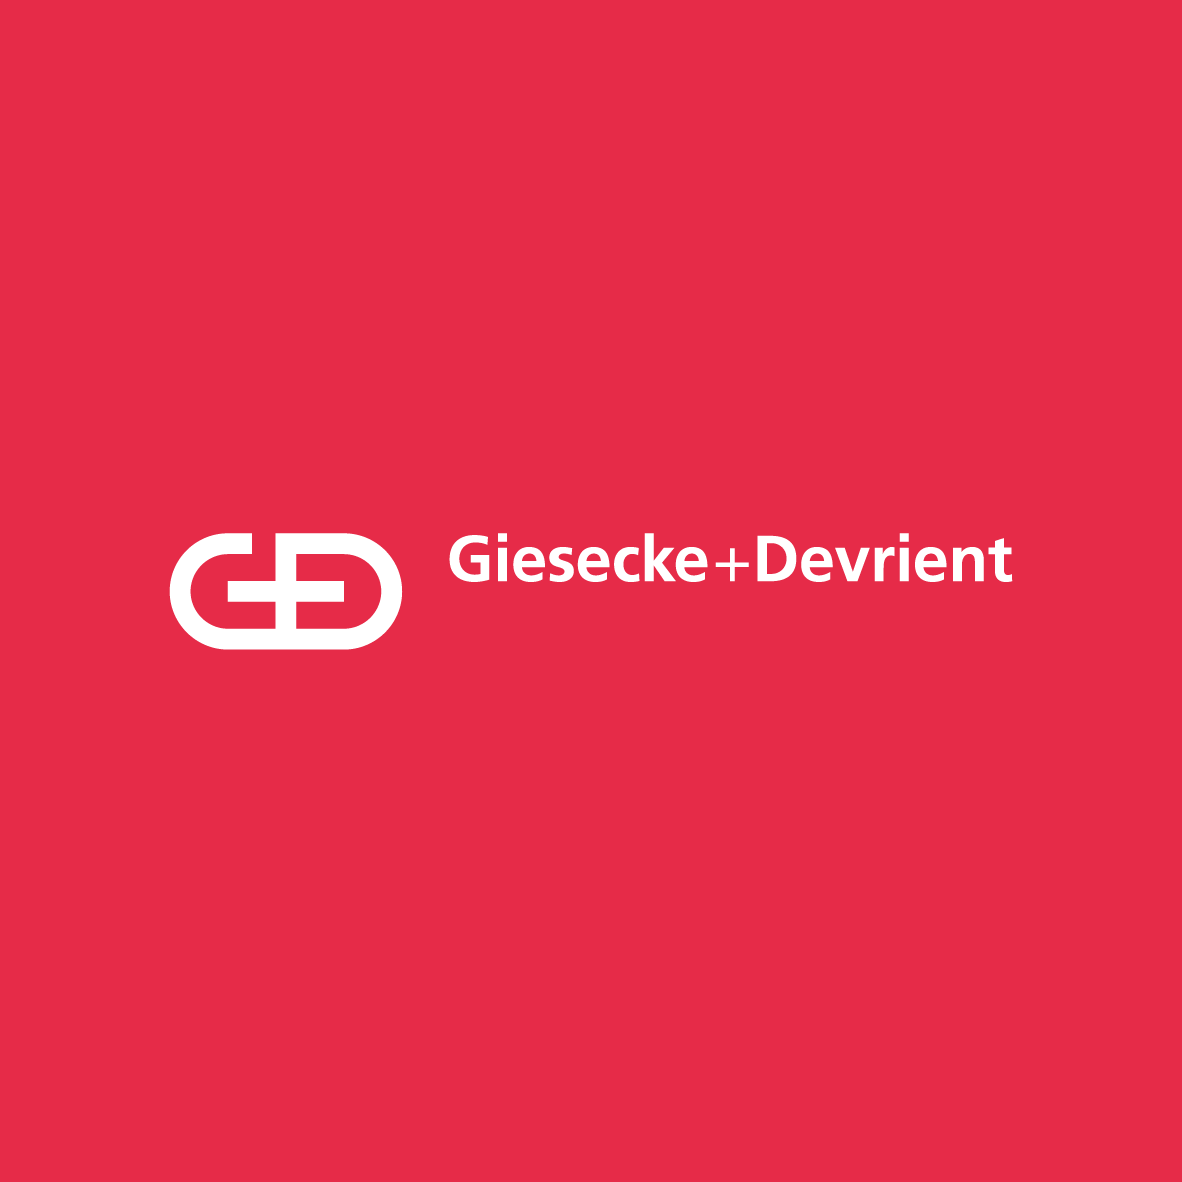 07_GIESECKE DEVRIENT.png